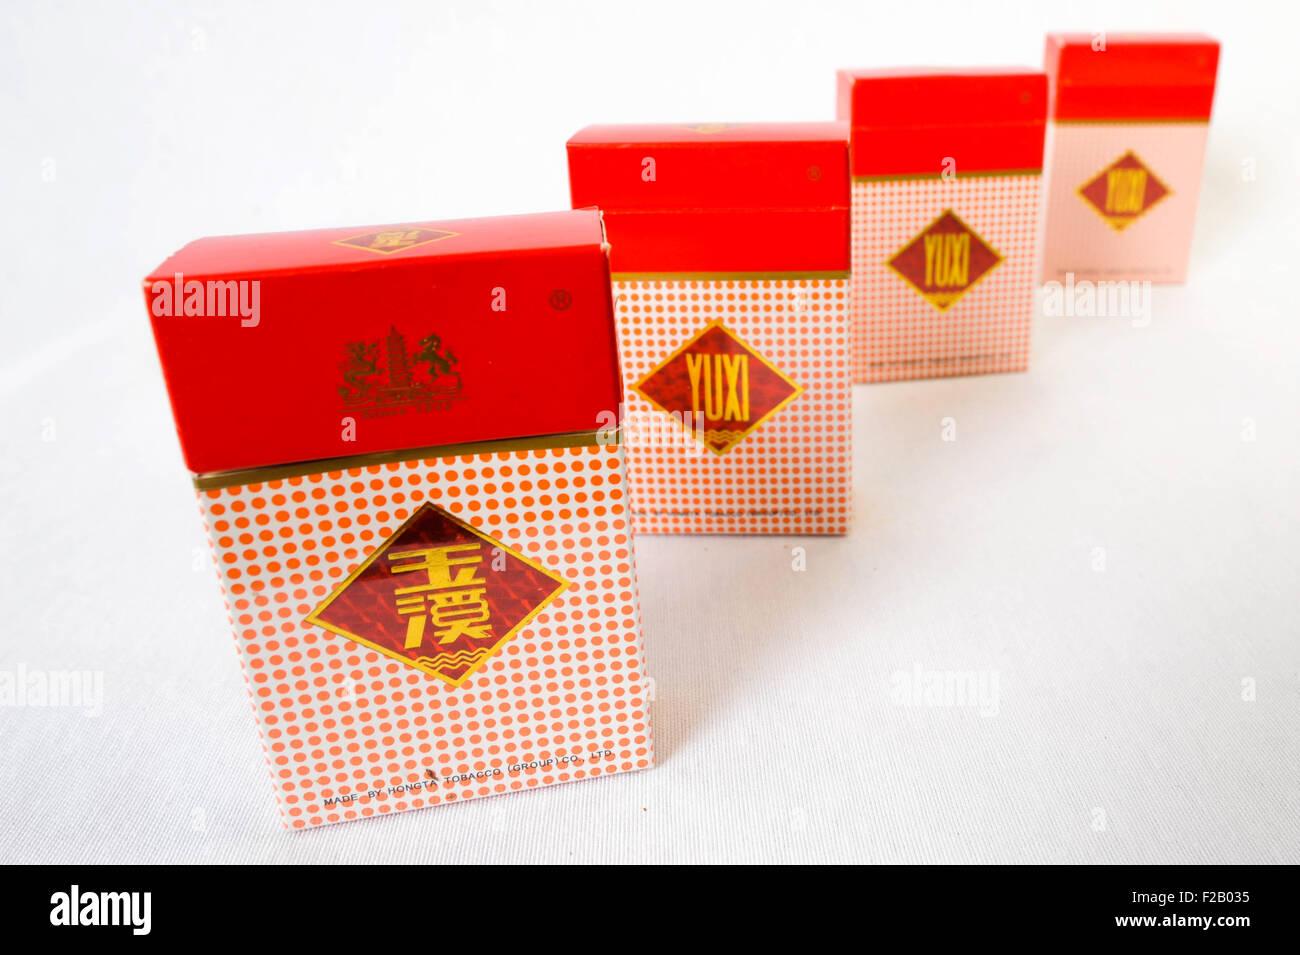 Black Russian cigarettes Karelia buy online